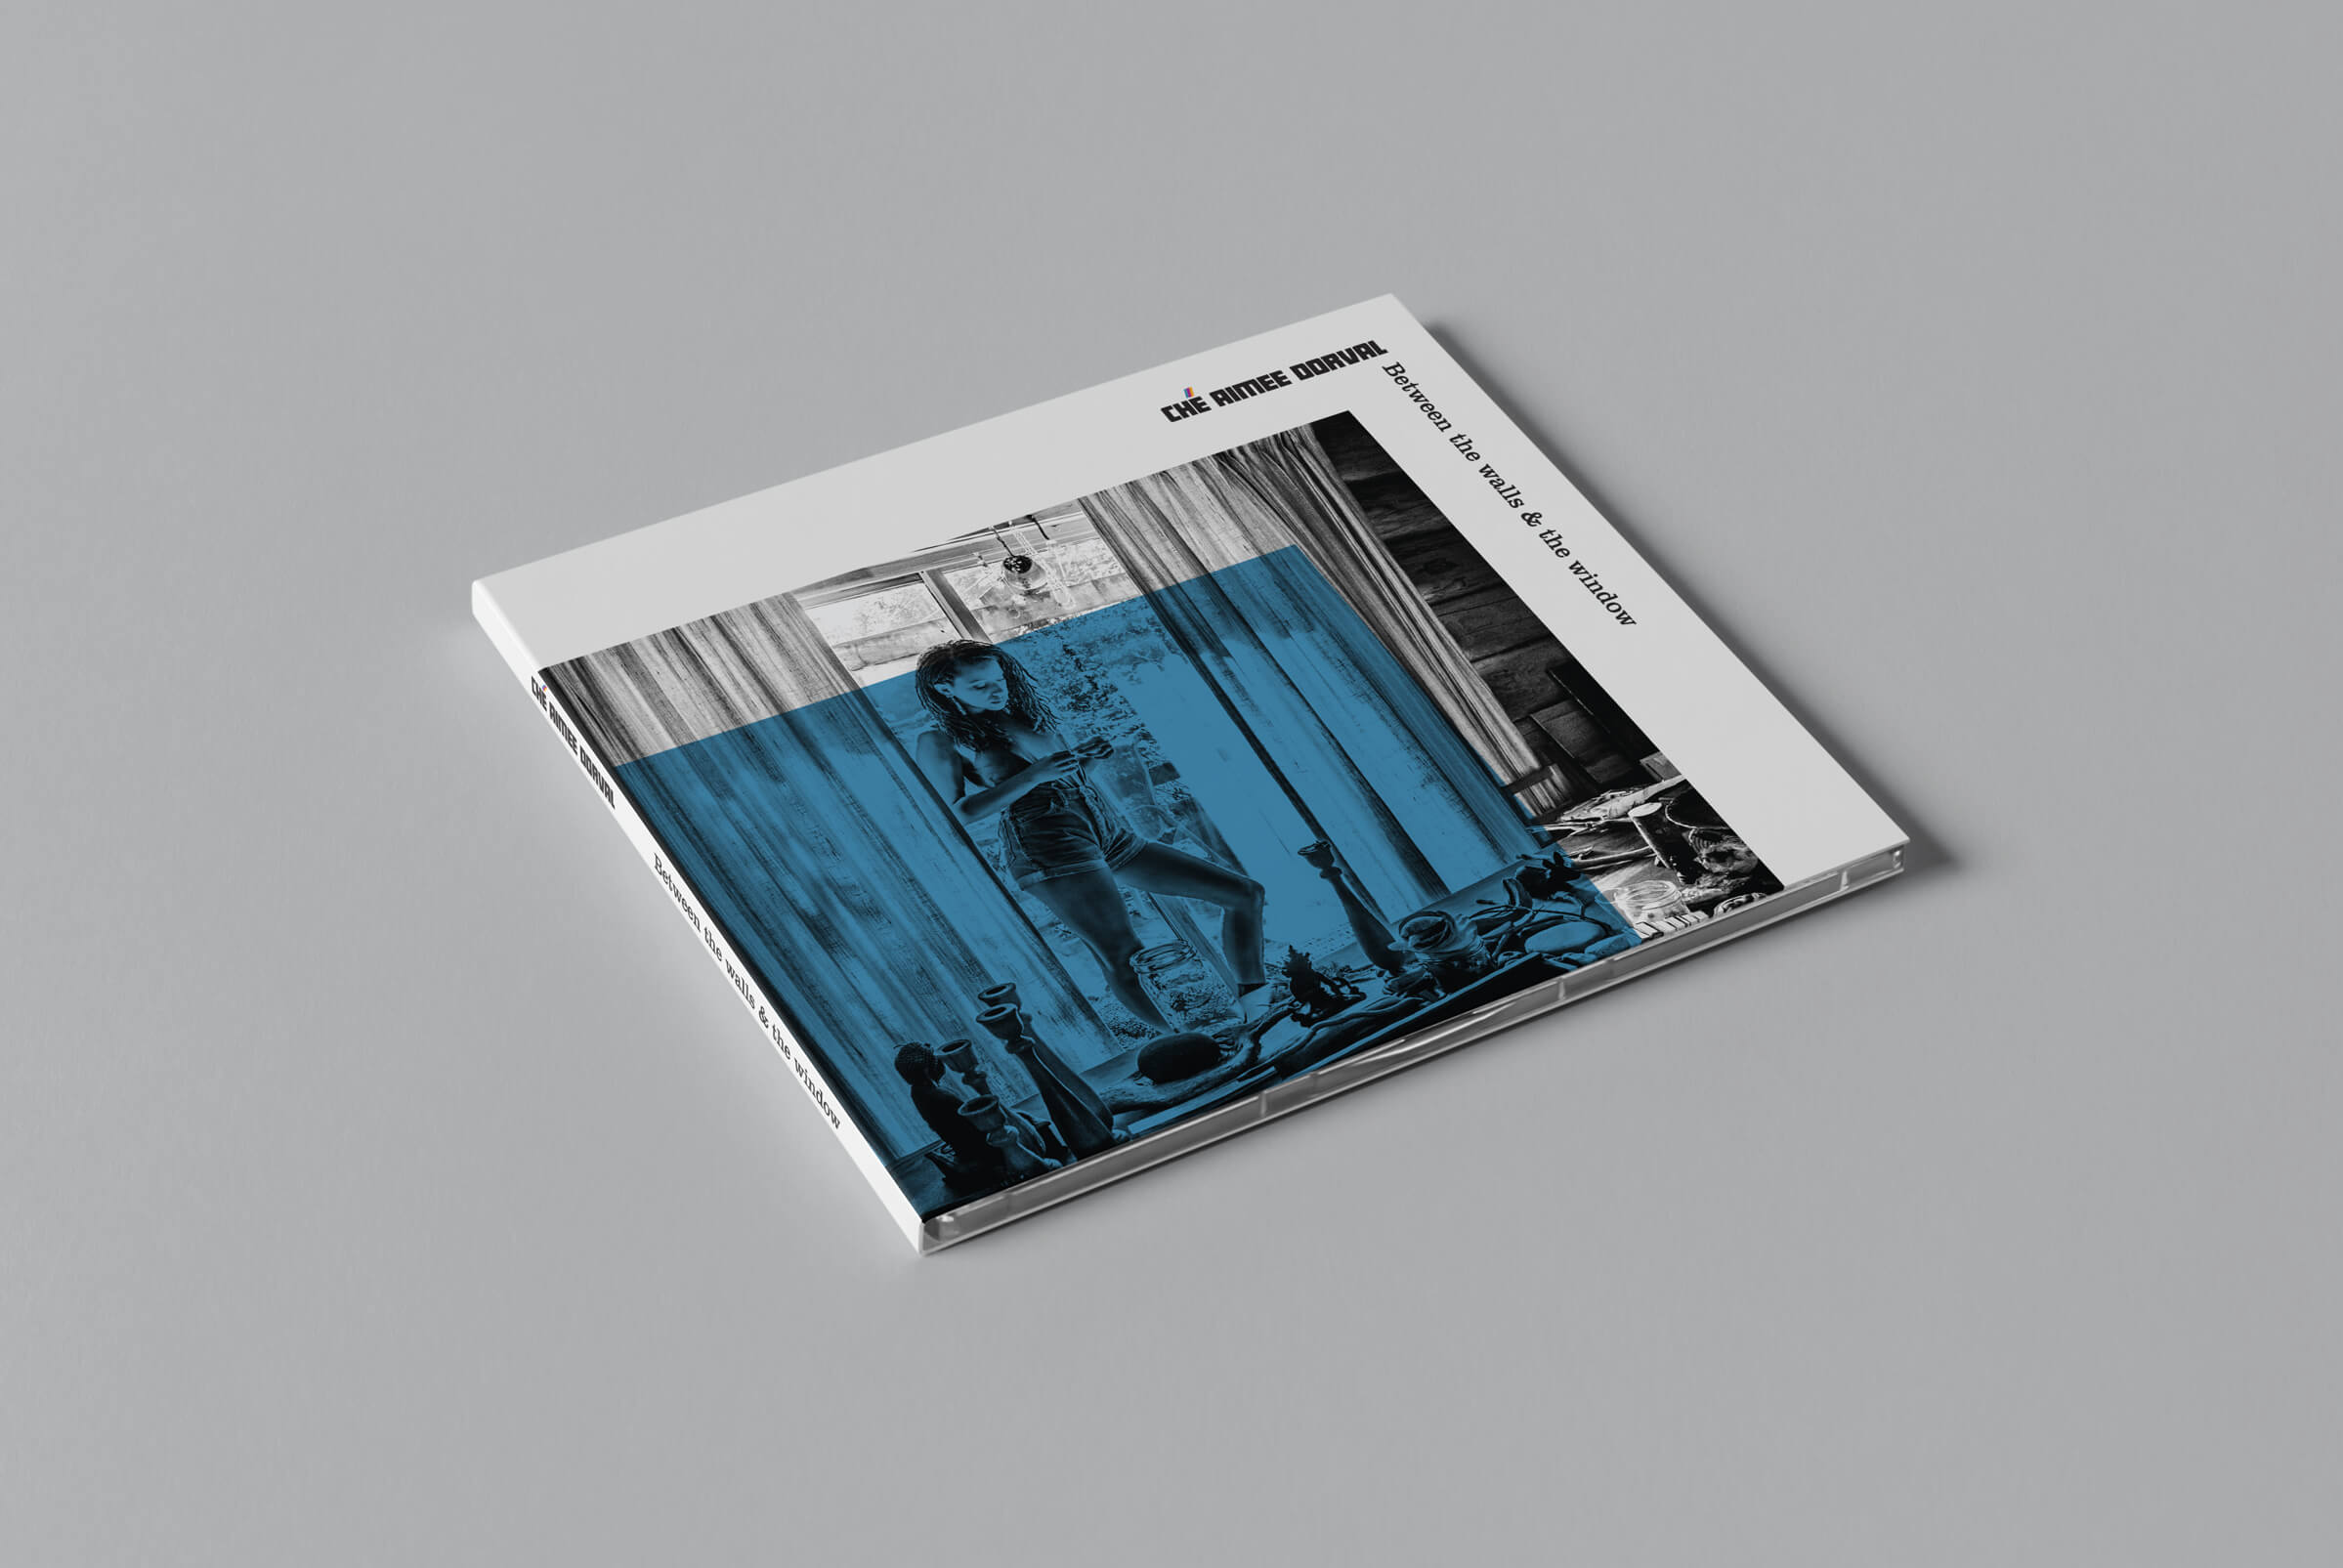 Album cover design for Ché Aimee Dorval by Ottawa Graphic Designer idApostle